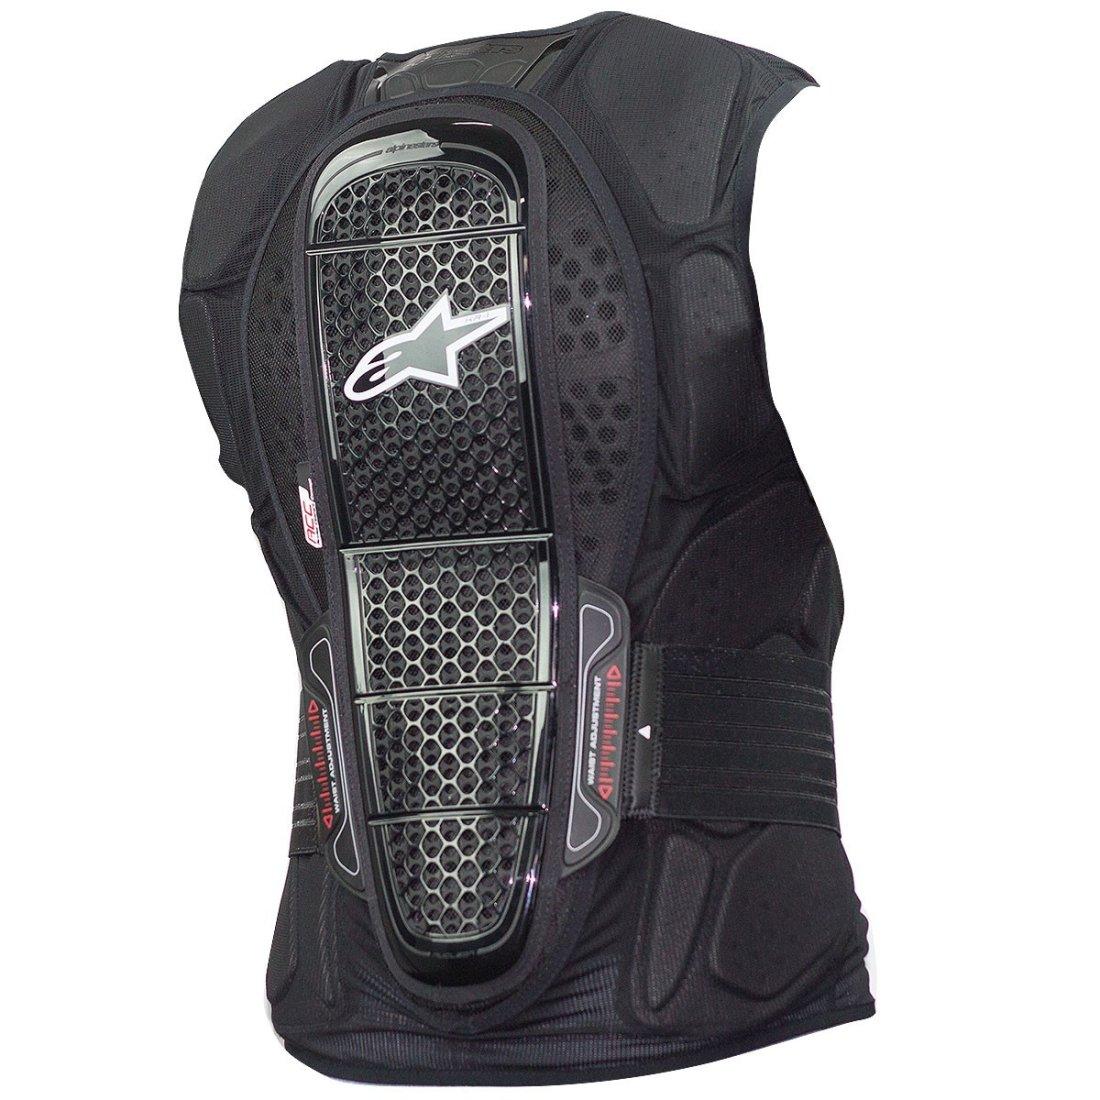 37f7650c Proteccion ALPINESTARS Track Vest 2 Black · Motocard